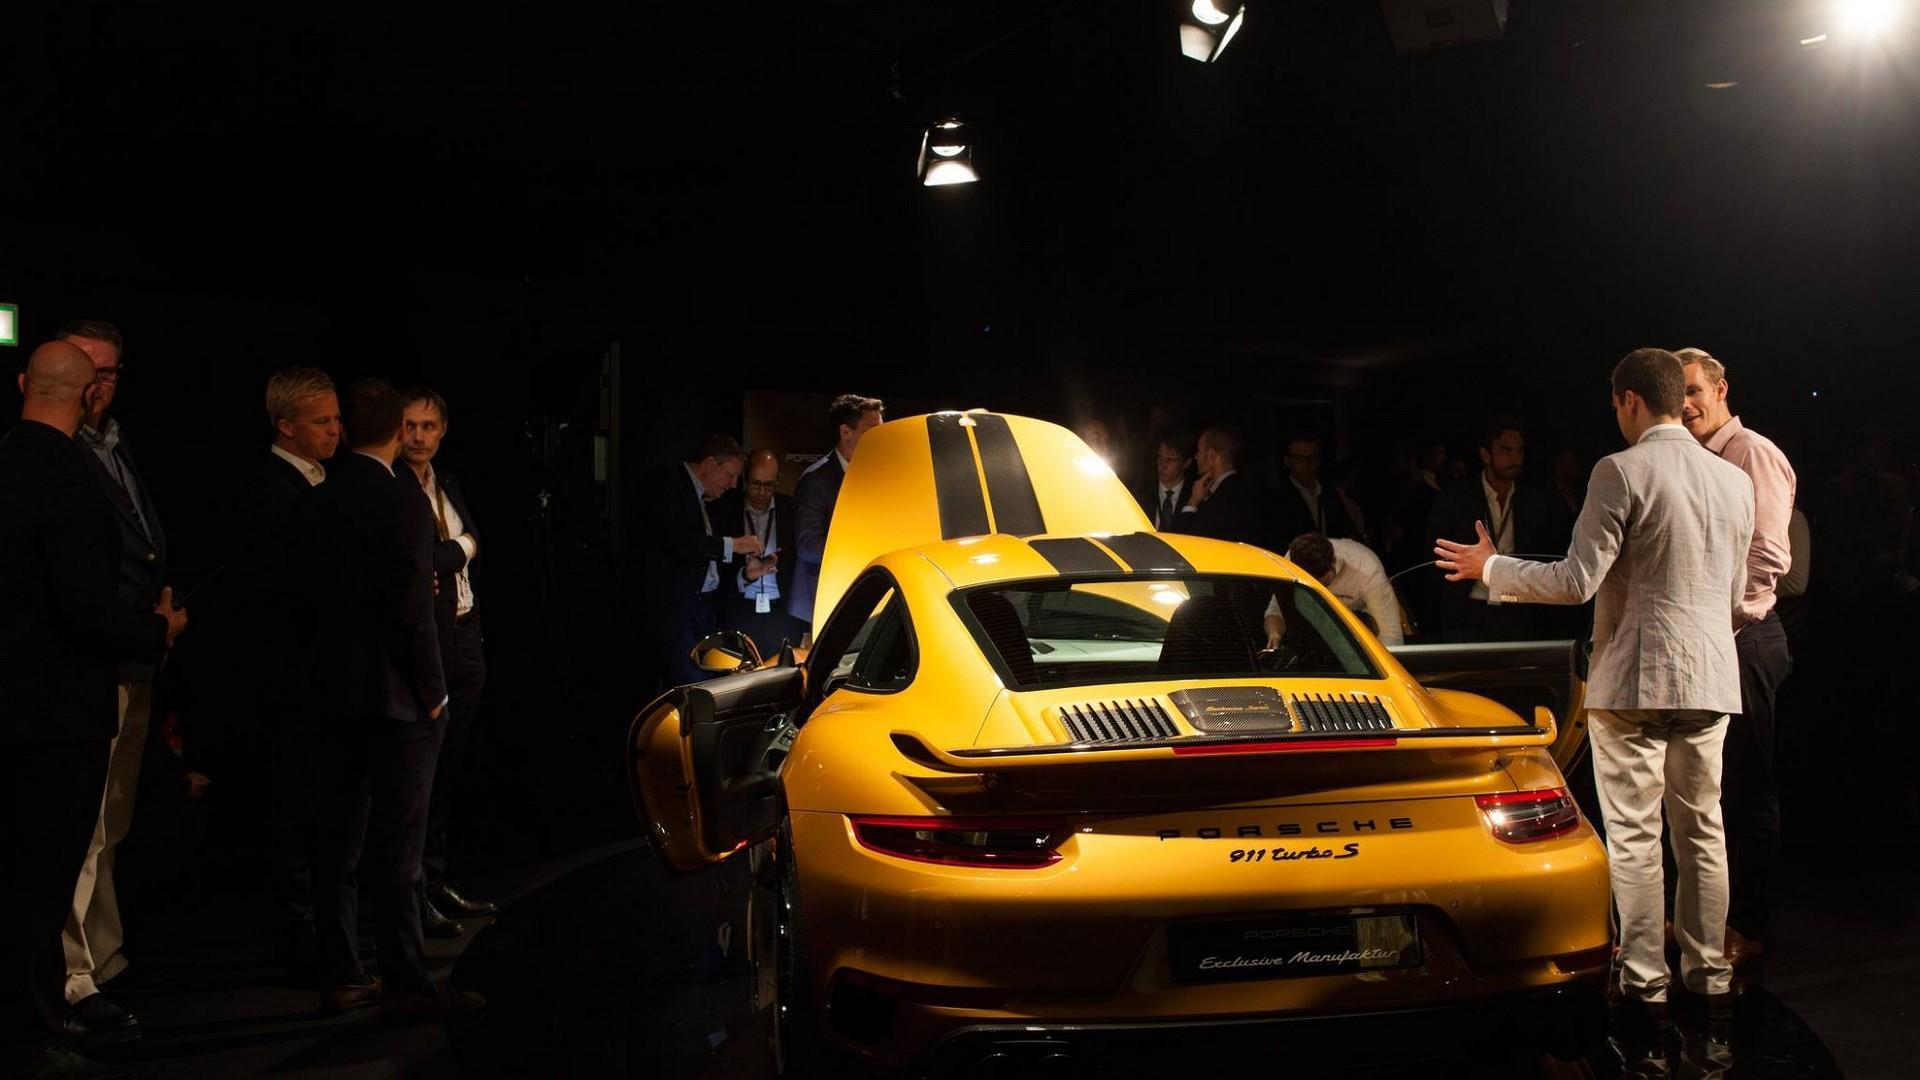 Porsche_911_Turbo_S_Exclusive_Series_10